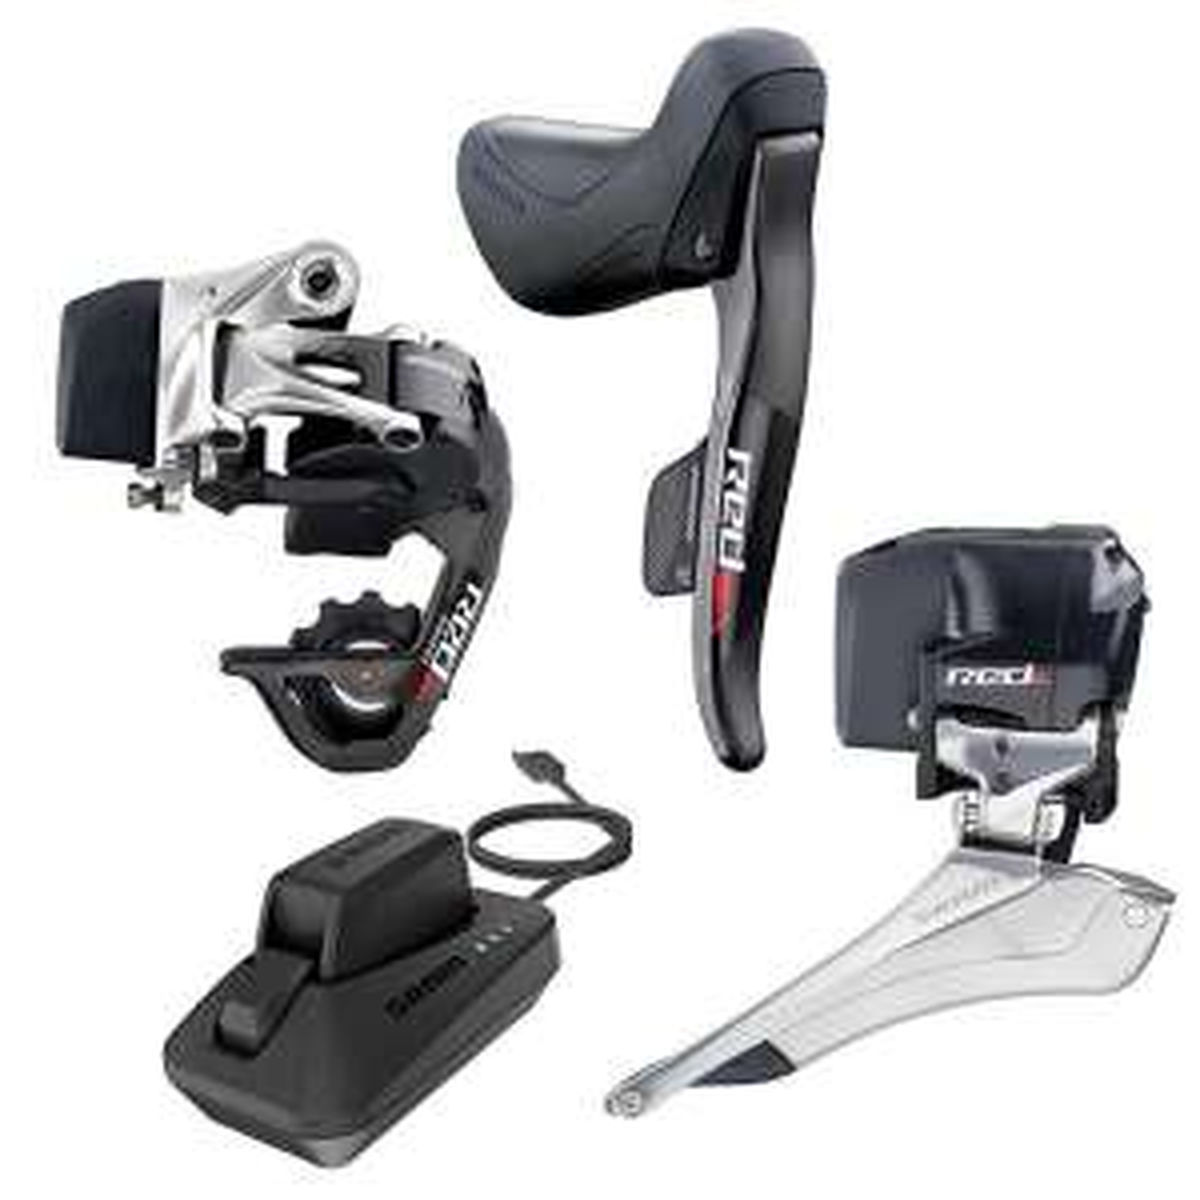 Sram Red eTap Groupset - Sale Special £899.99 @ Merlin Cycles